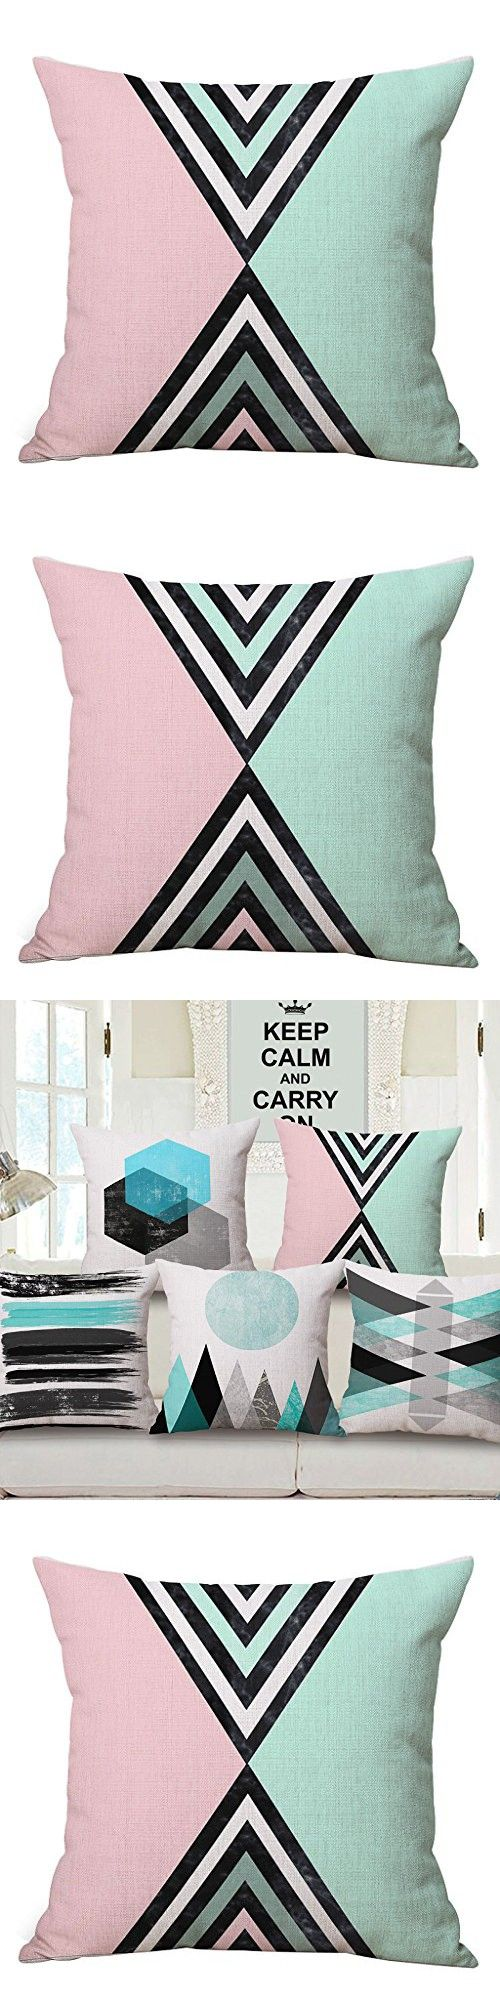 JES&MEDIS Colorful Geometric Throw Pillow Cushion Cover Home Decor Pillowcase 18x18 inch